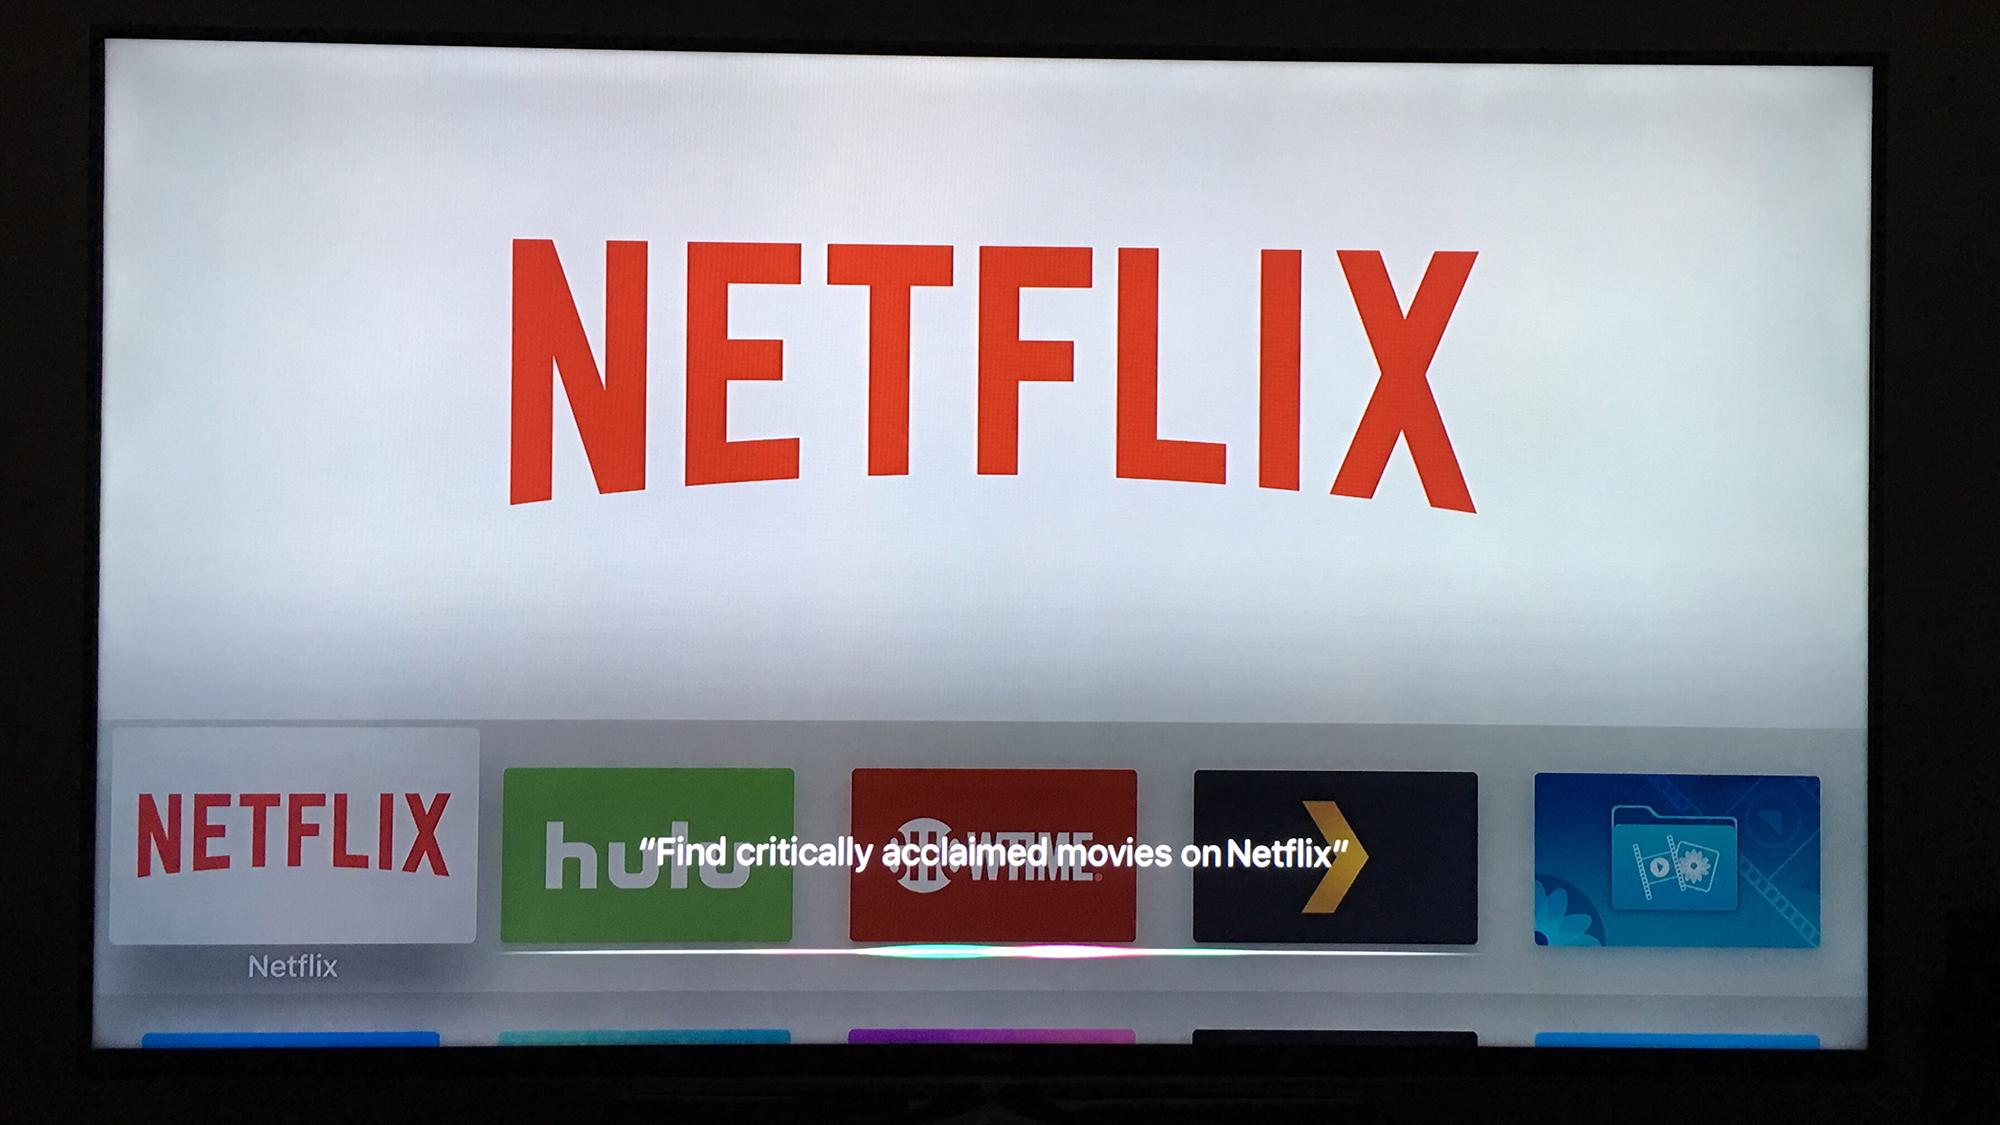 Siri - Critically acclaimed movies on Netflix